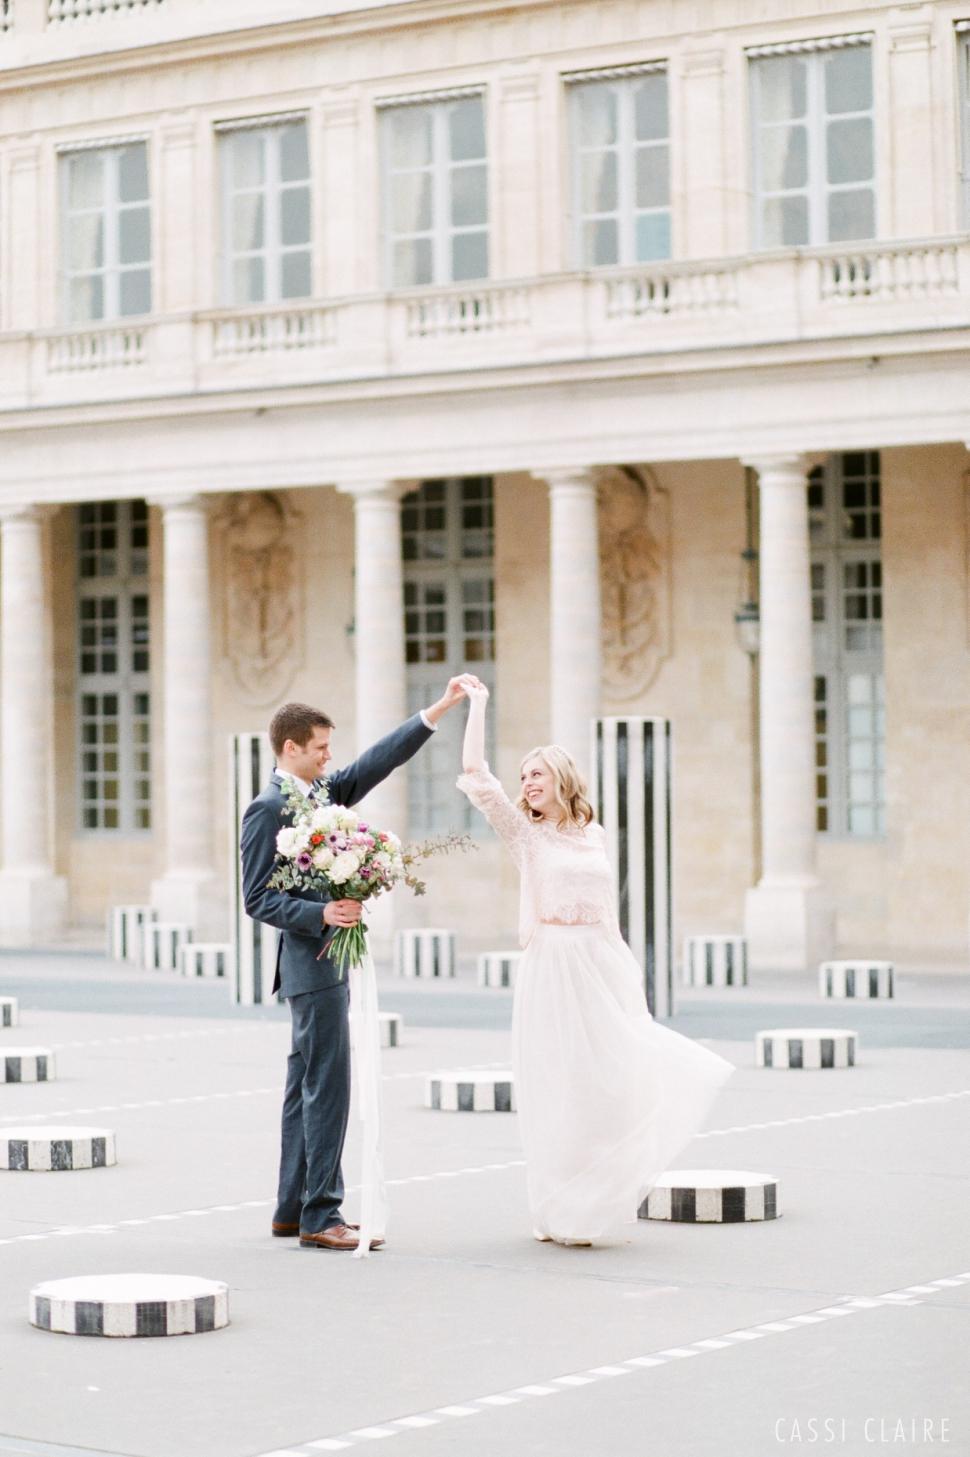 Paris-France-Wedding_CassiClaire_45.jpg